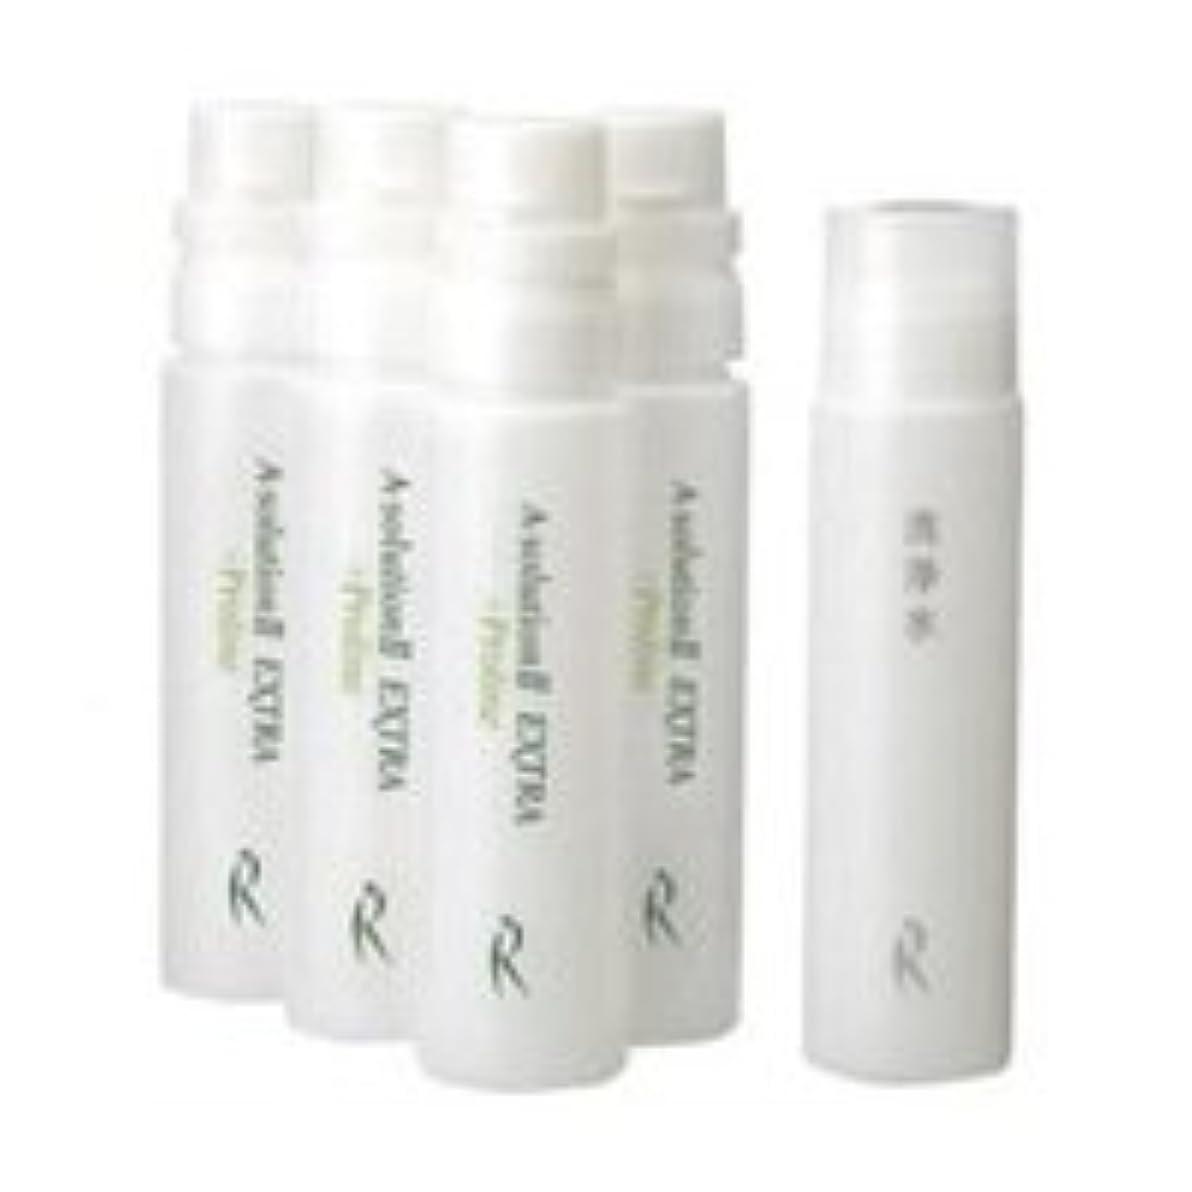 A-ソリューション エクストラ+プロリン / REVENIR  レブニール プラチナアクイシモ専用美容液